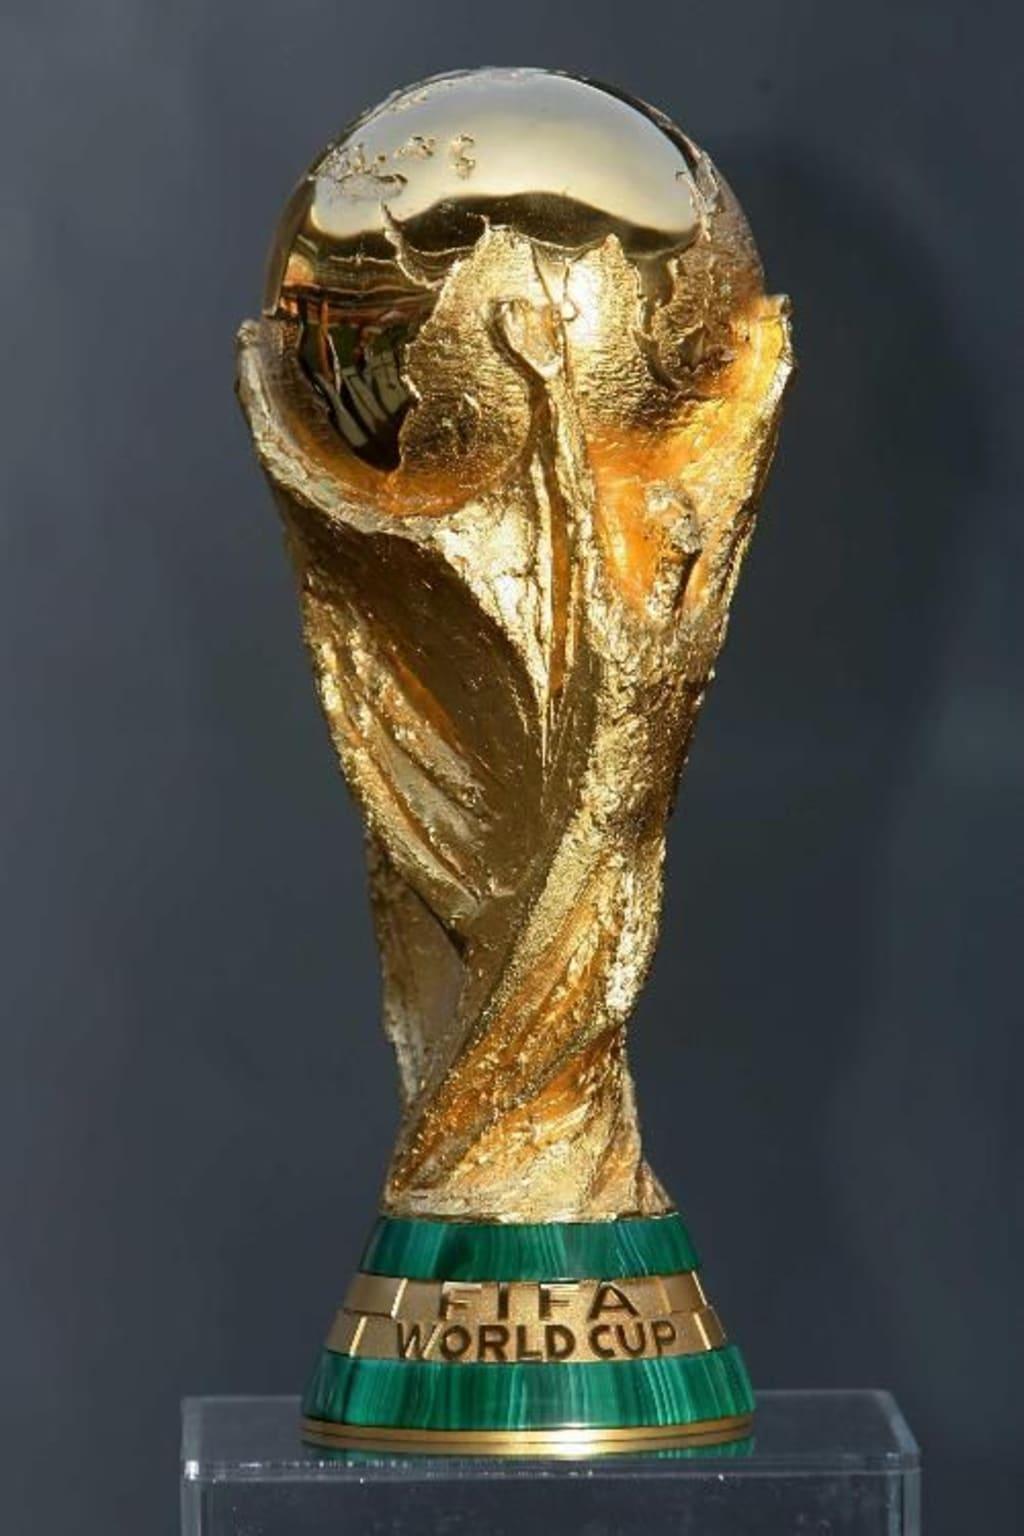 European Dominance at FIFA World Cup 2018